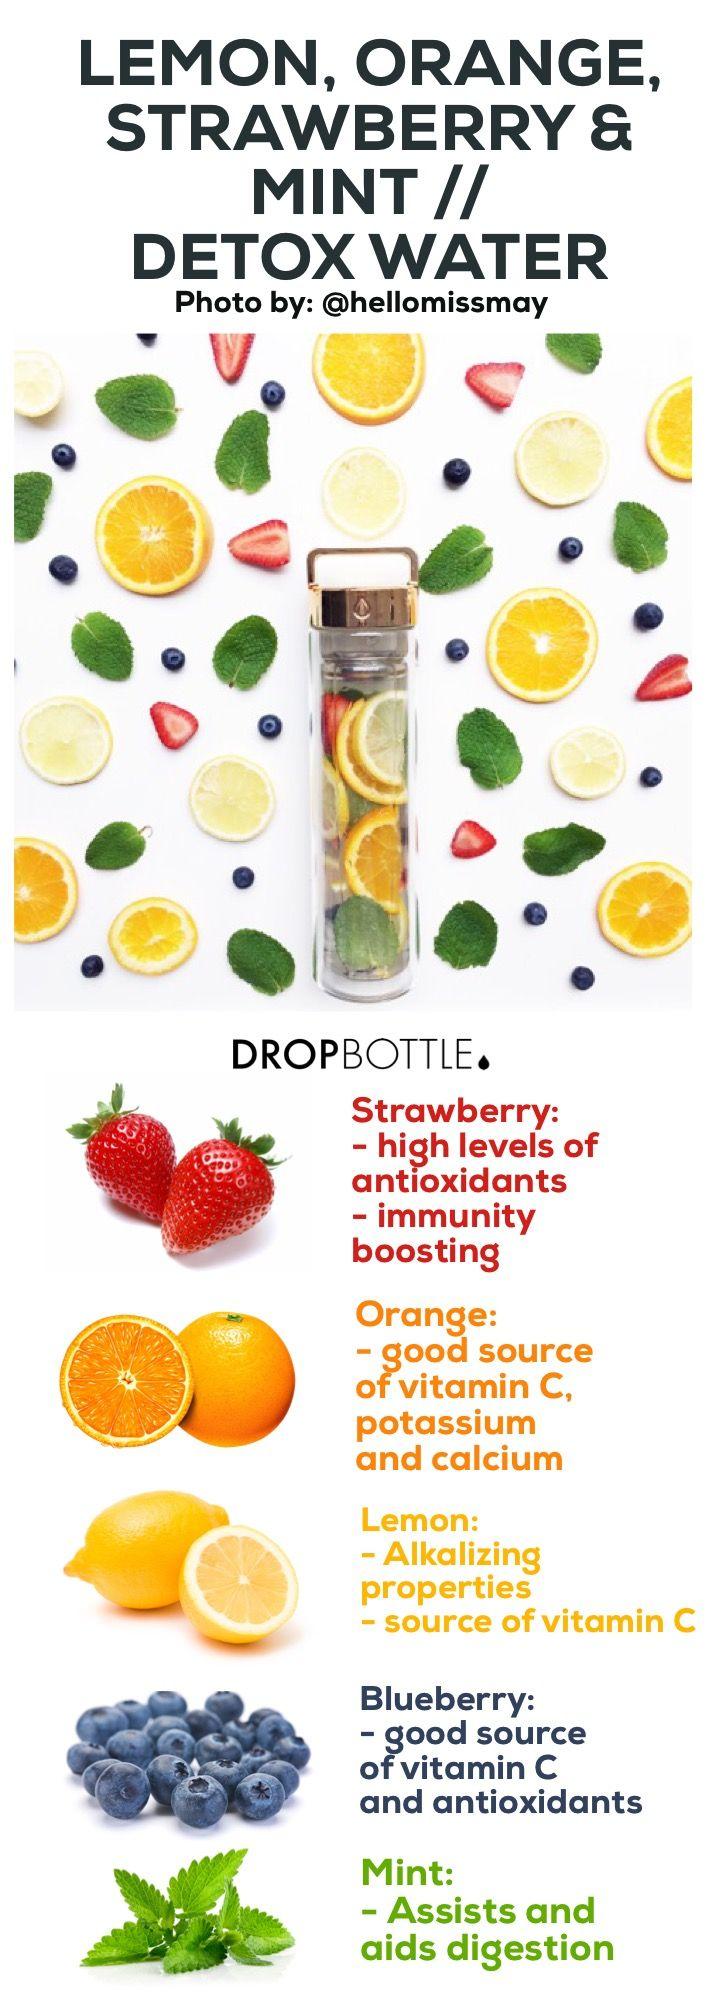 Lemon, Orange, Strawberry, Blueberry & Mint Detox Water // By @hellomissmay